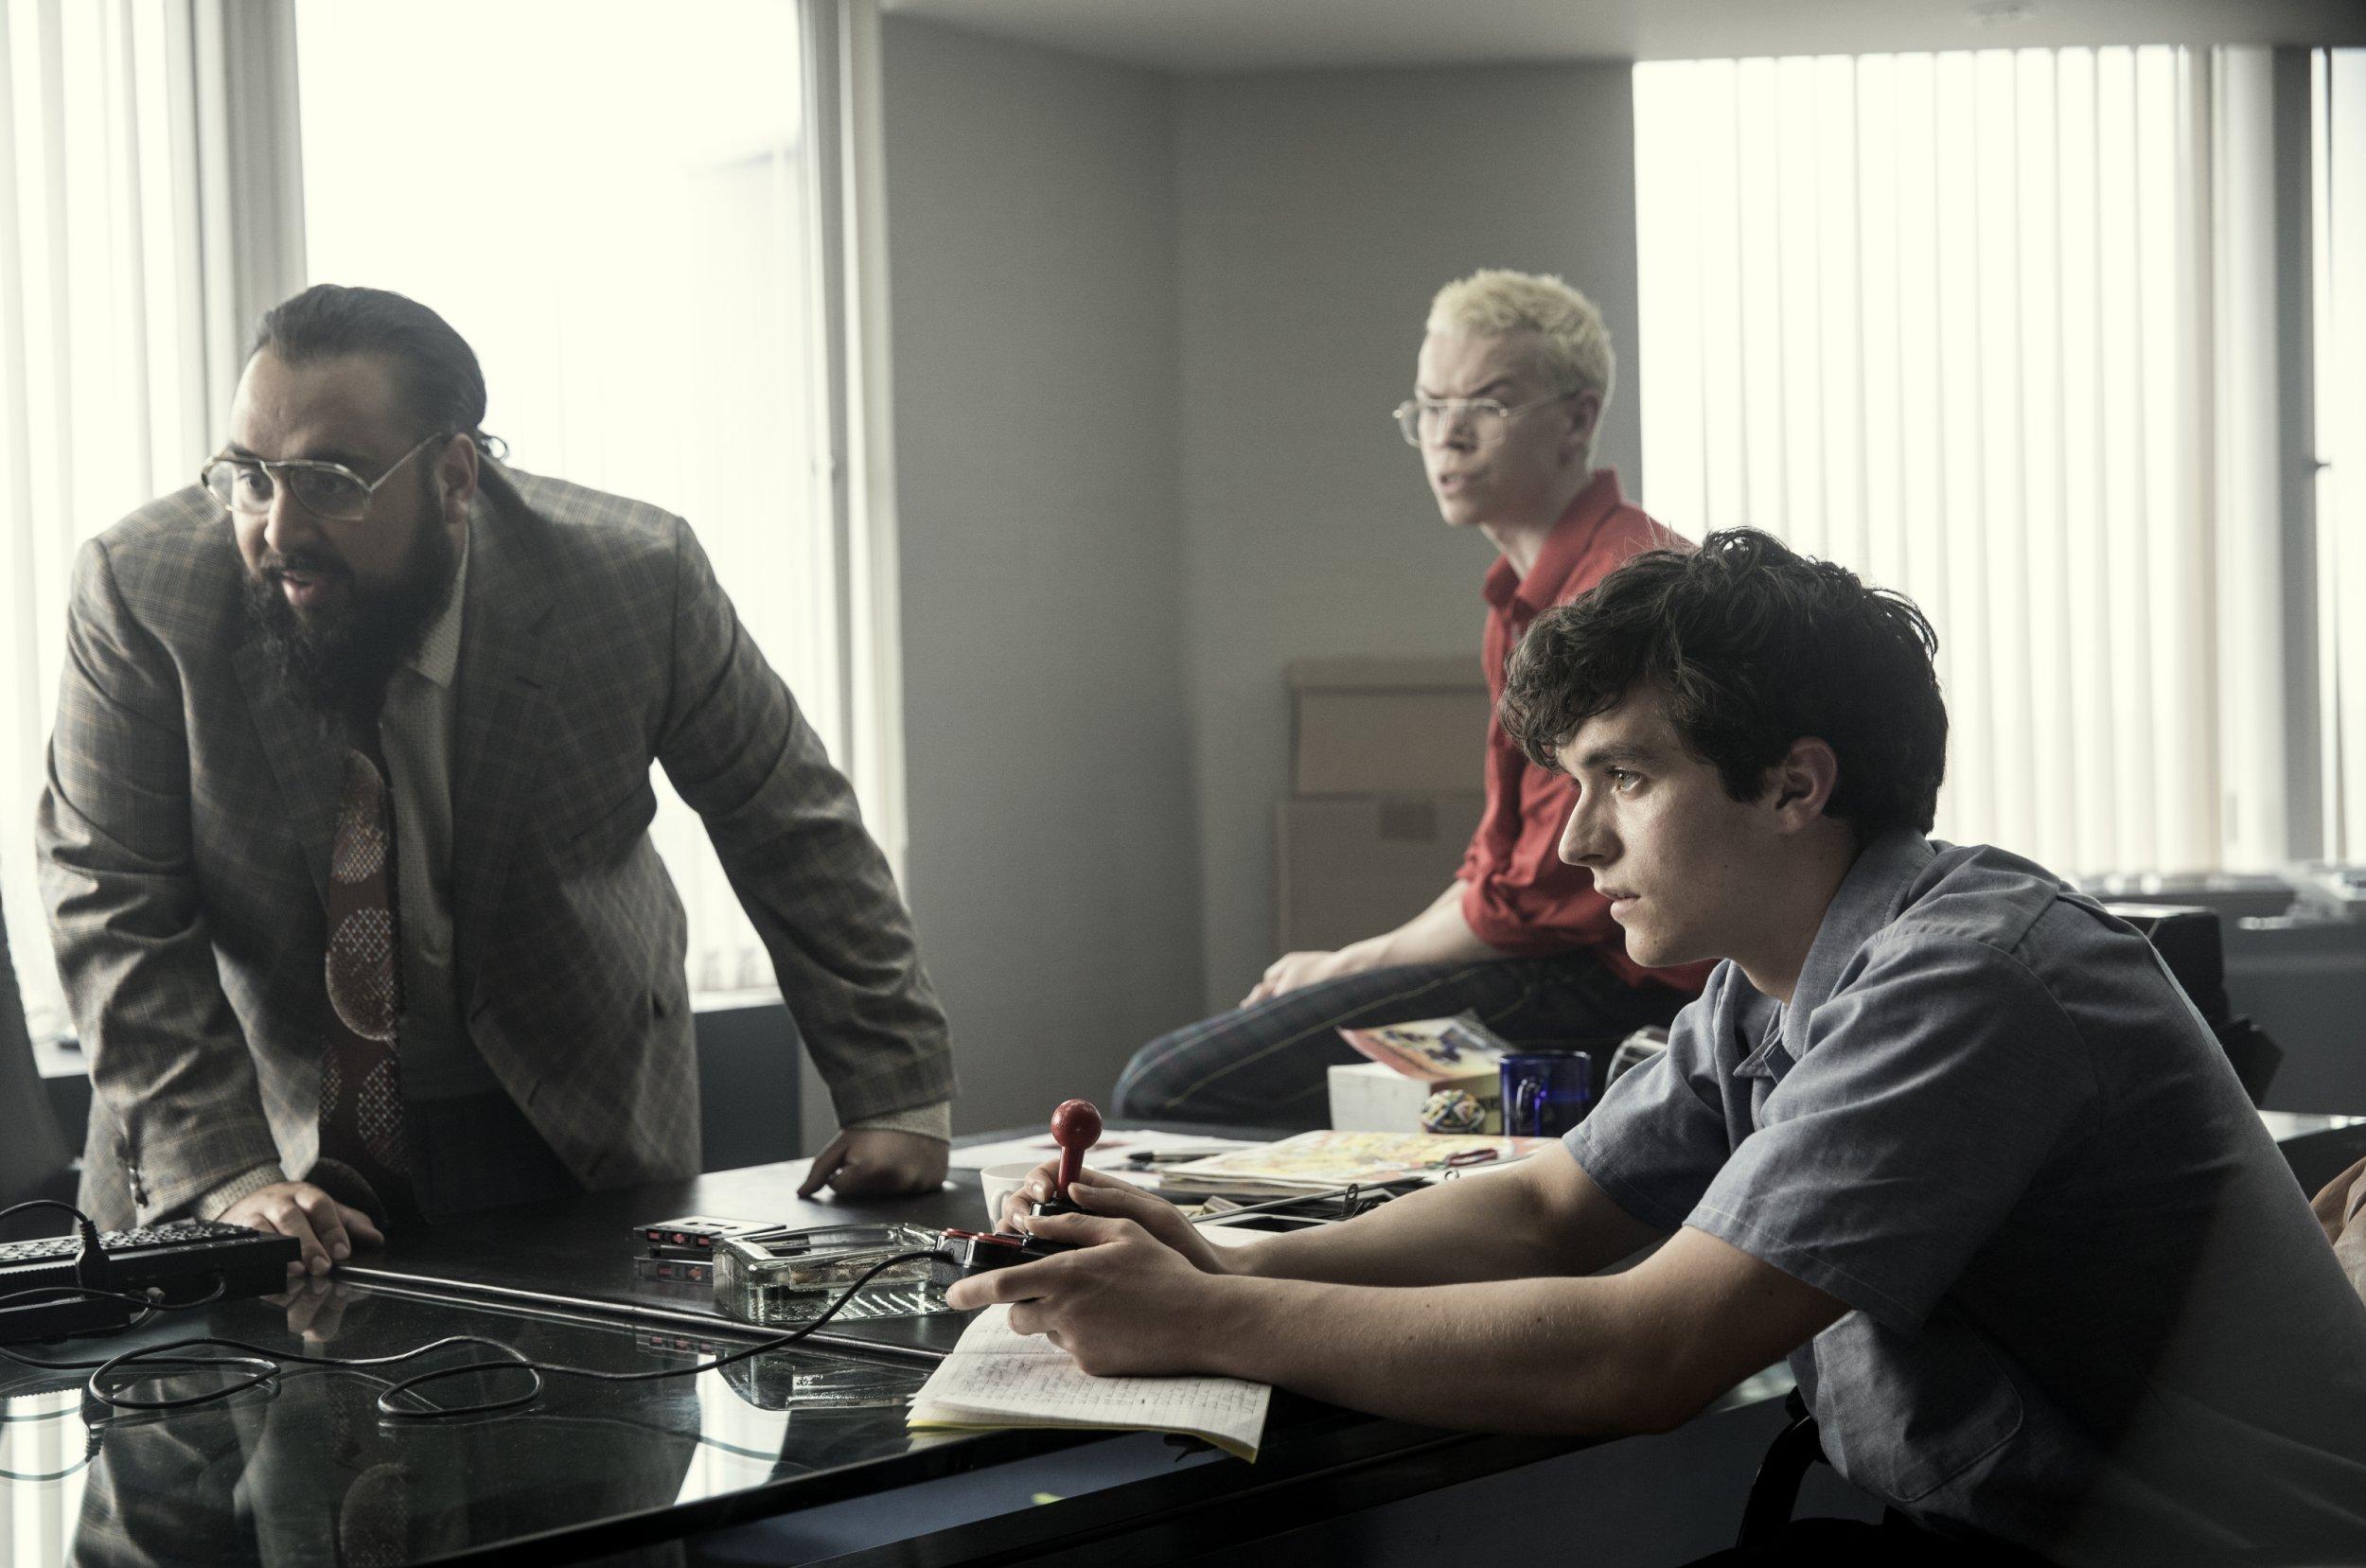 Netflix planning way more interactive shows after Black Mirror: Bandersnatch success